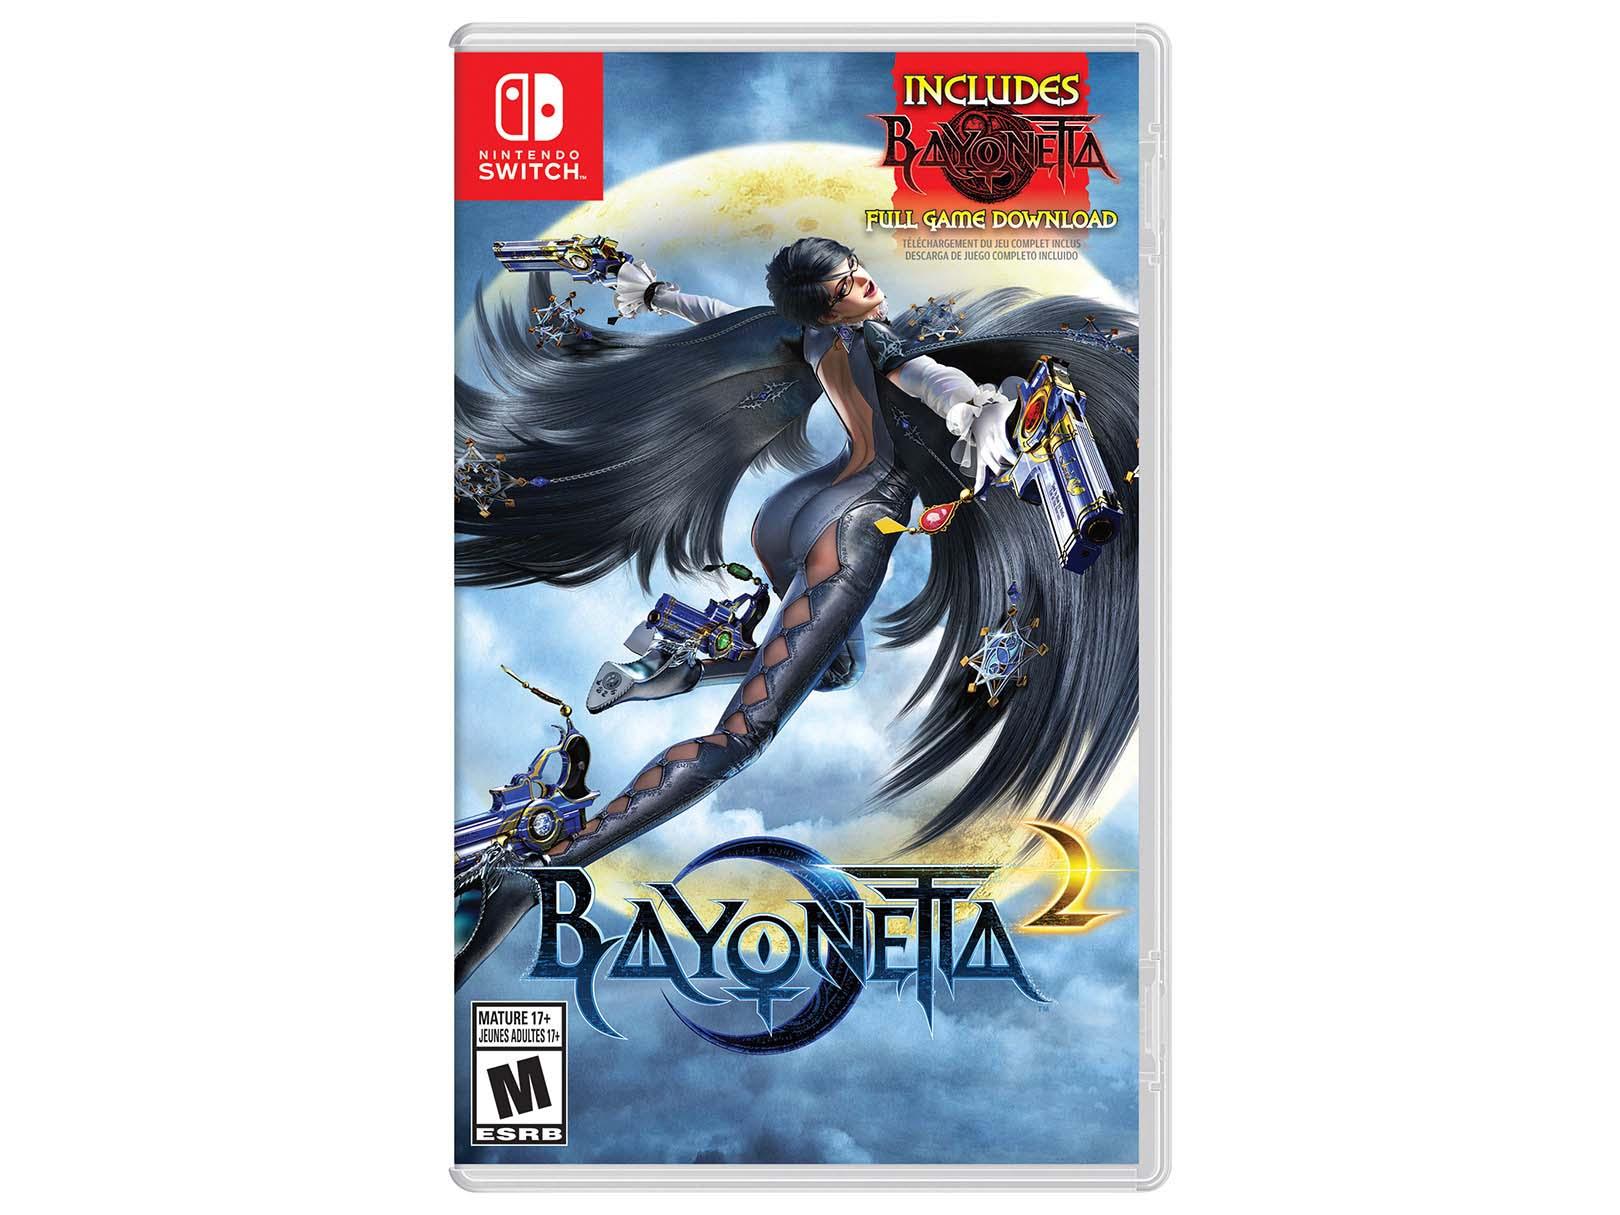 Liverpool: Bayonetta 2 Nintendo Switch (Incluye Bayonetta 1 en digital)